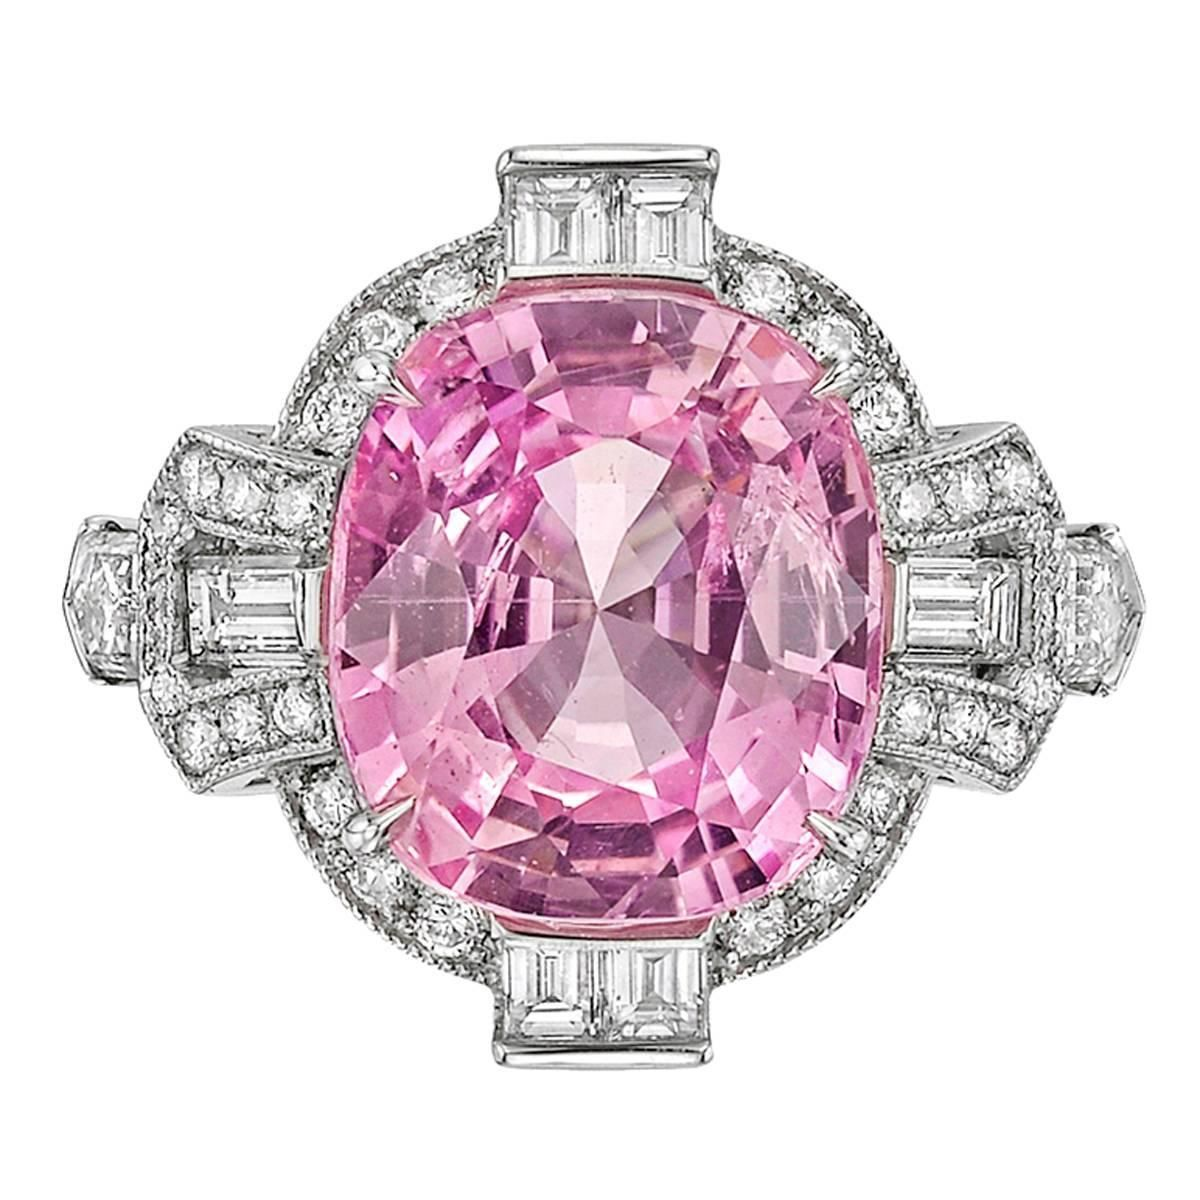 Raymond C. Yard 6.22 Carat Pink Sapphire Diamond Platinum Ring ...